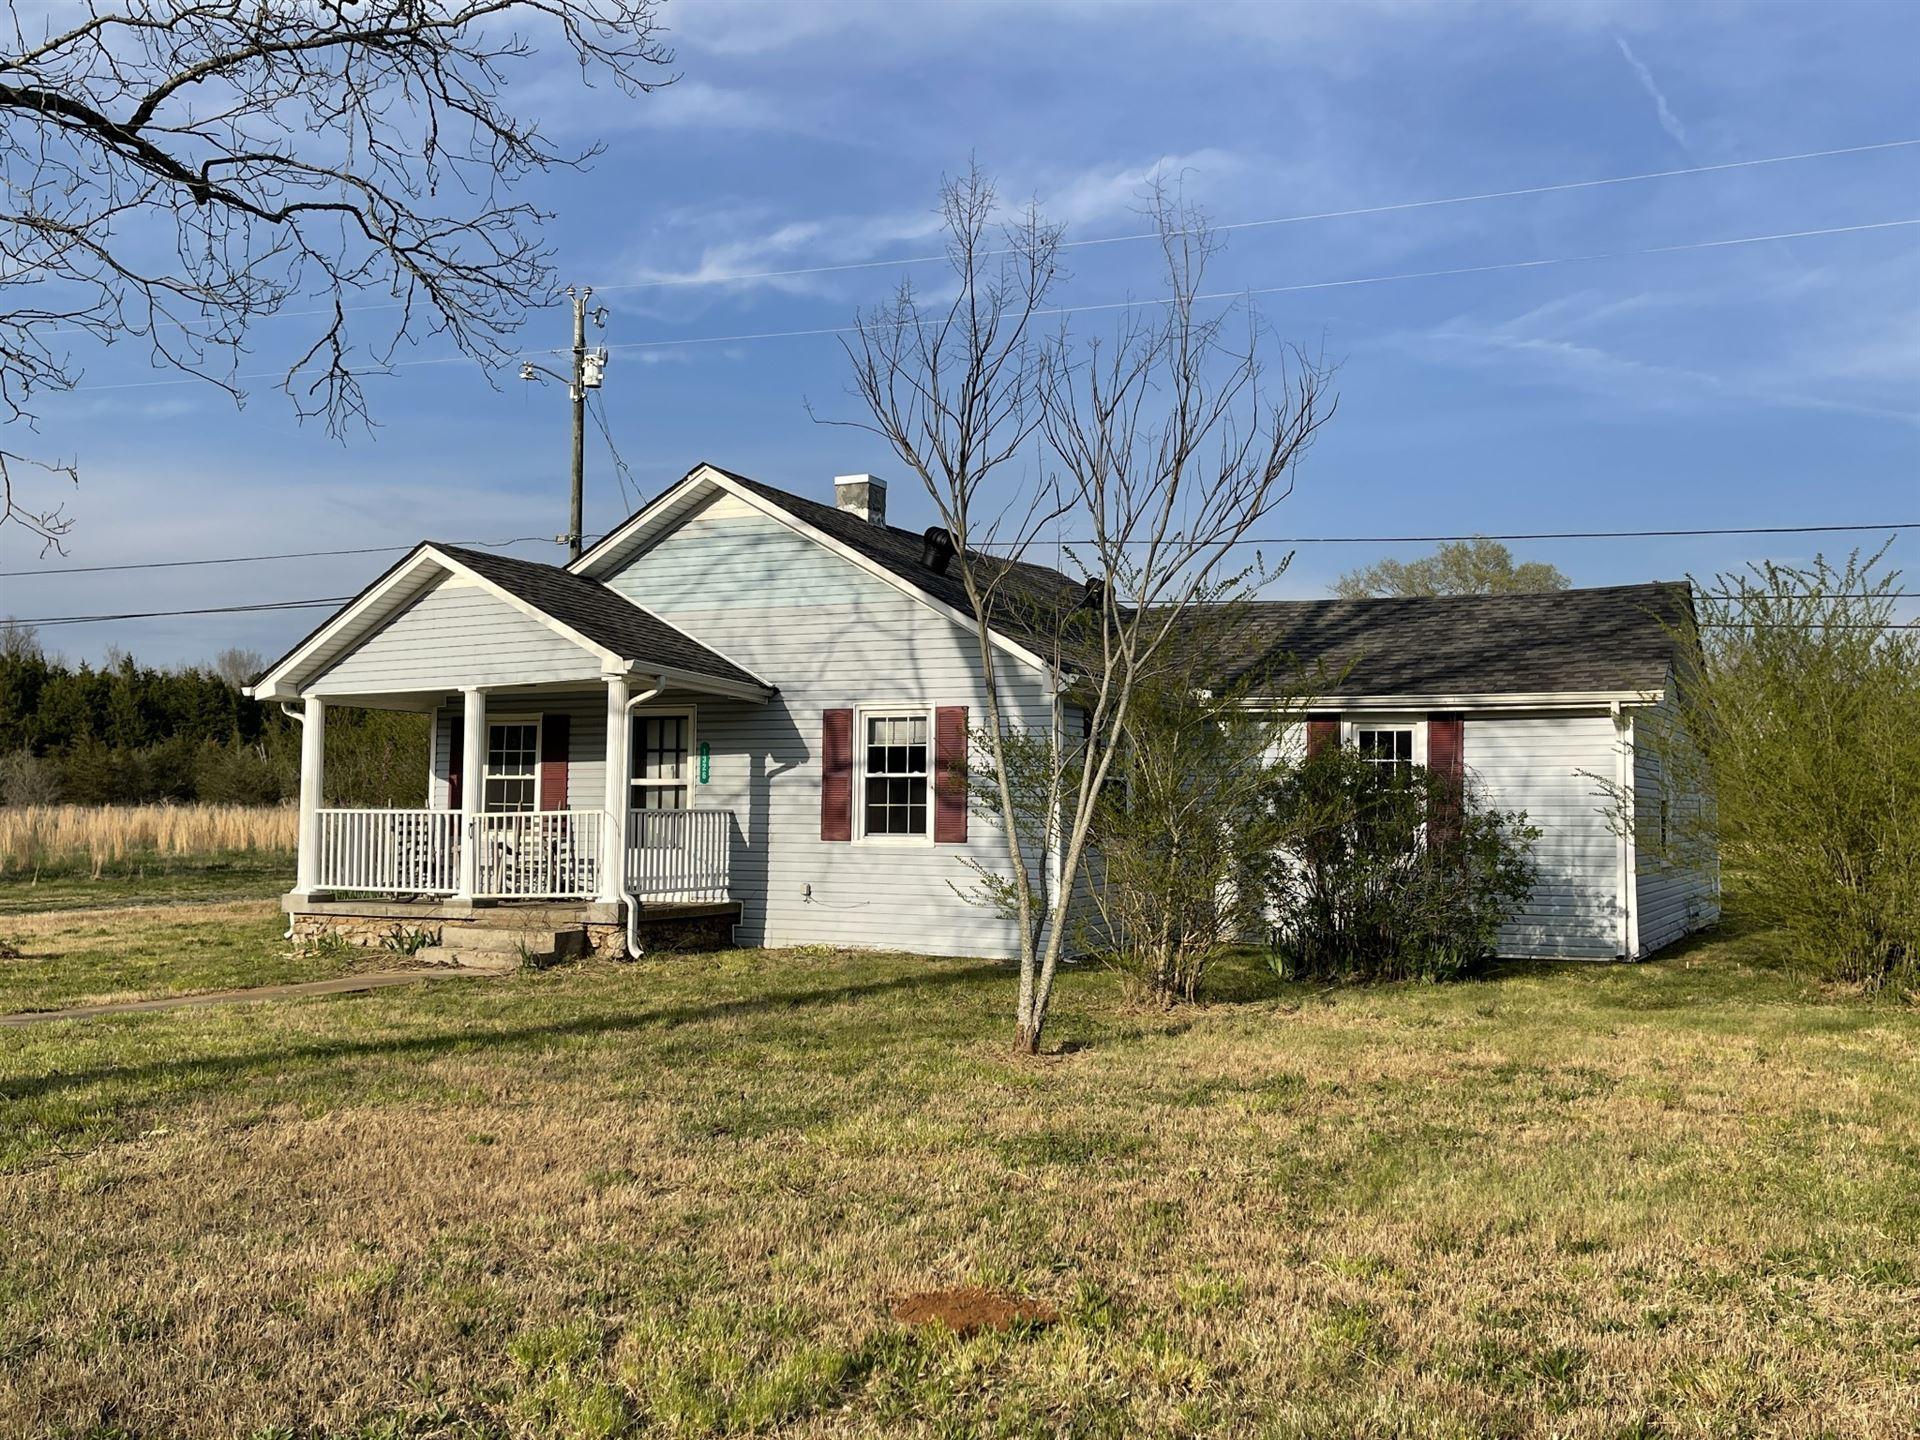 Photo of 1326 Flat Rock Rd, Murfreesboro, TN 37130 (MLS # 2248169)